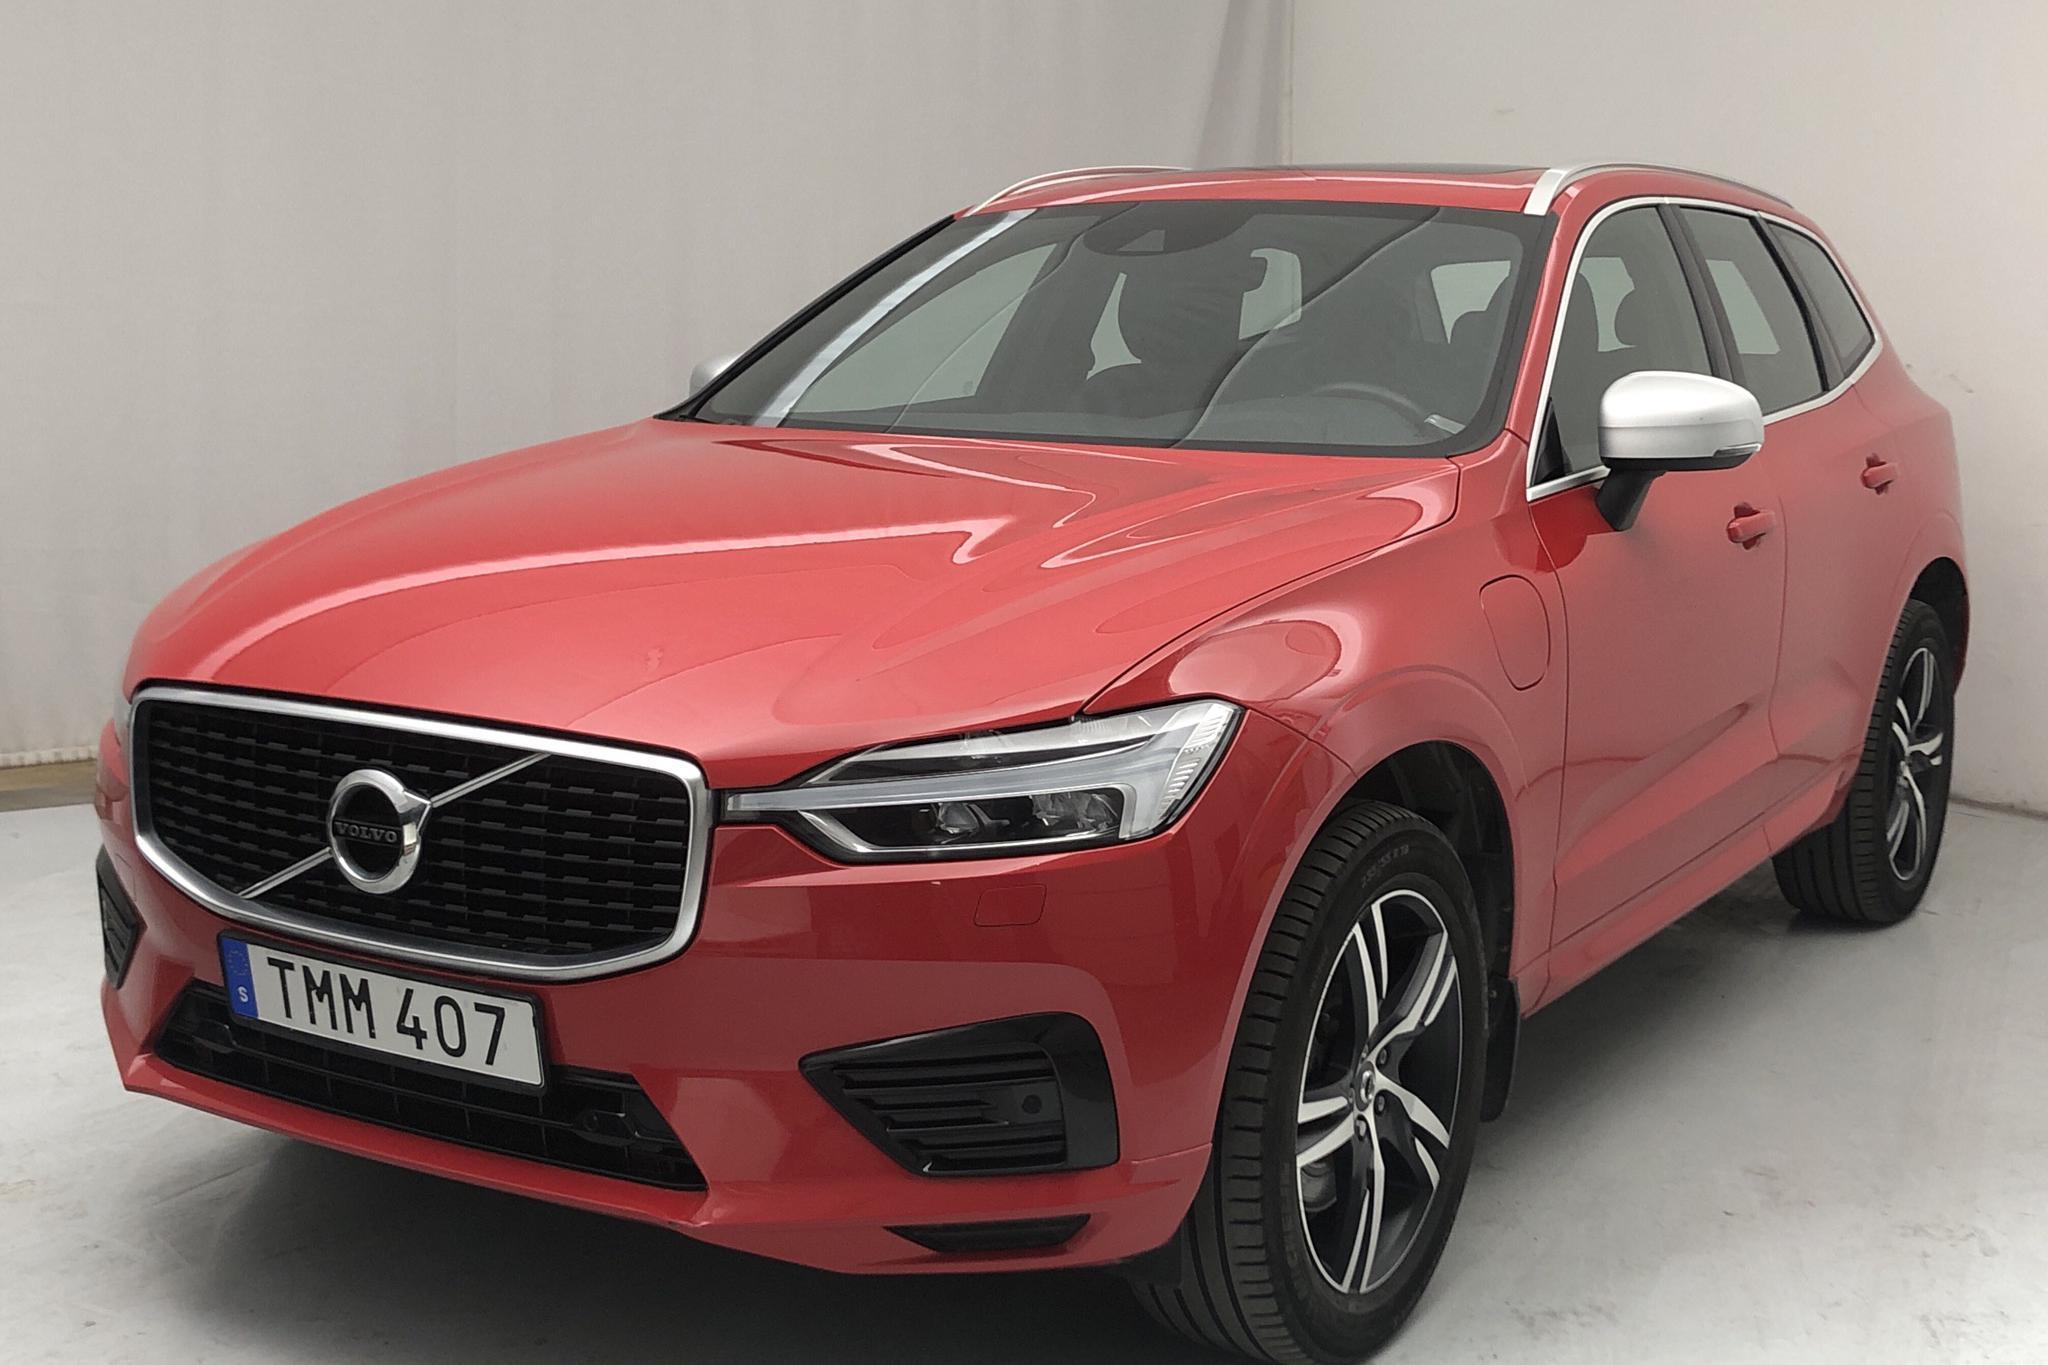 Volvo XC60 T8 AWD Twin Engine (390hk) - 88 510 km - Automatic - red - 2019